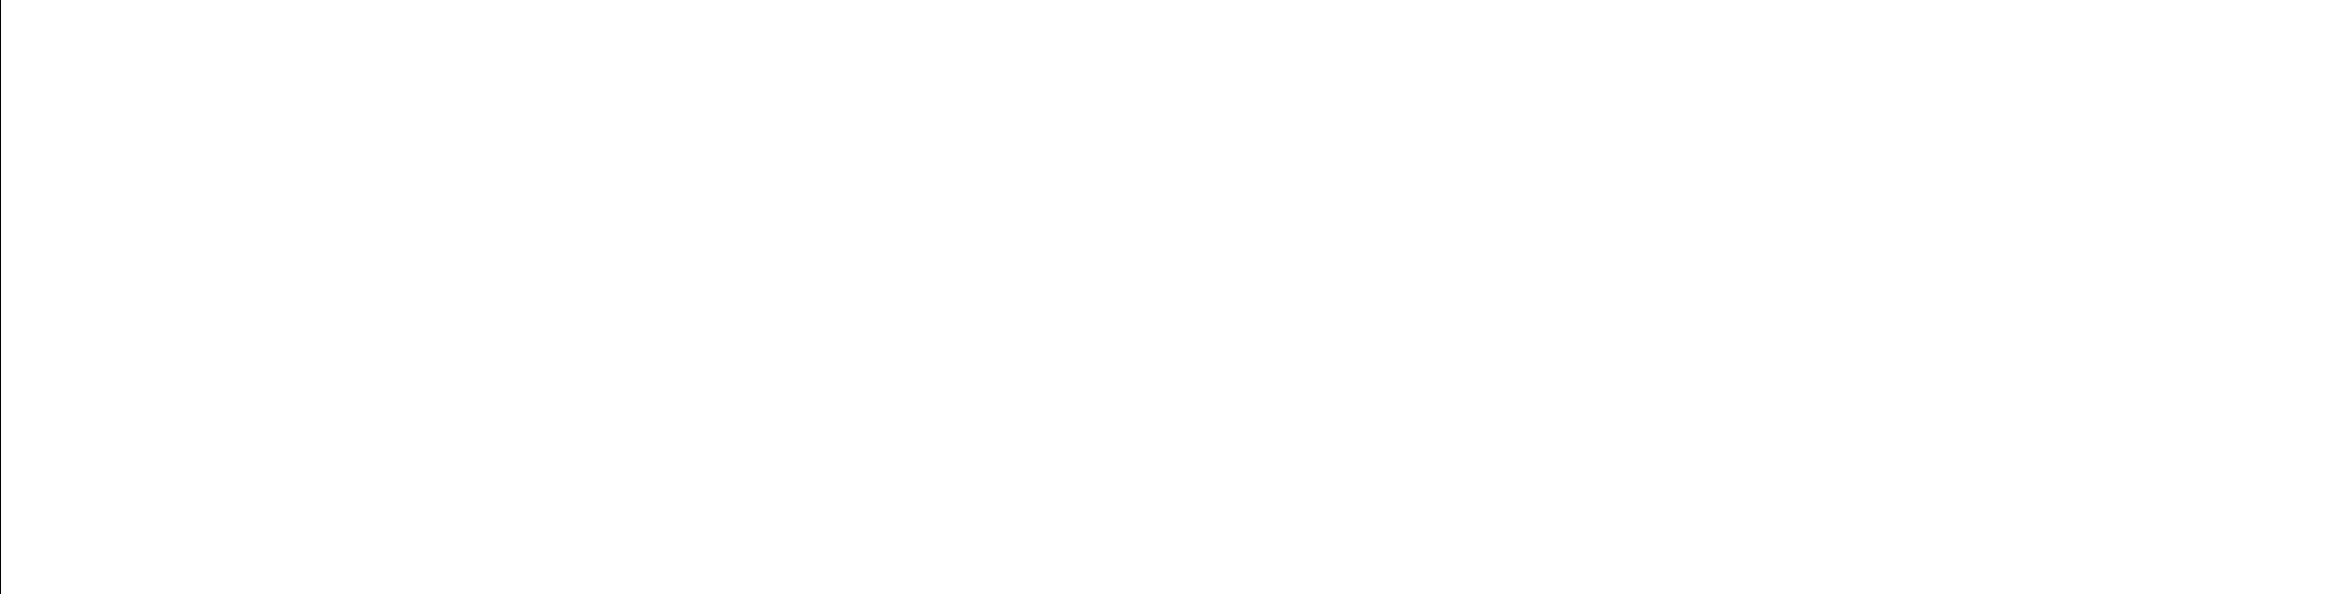 David J Frank